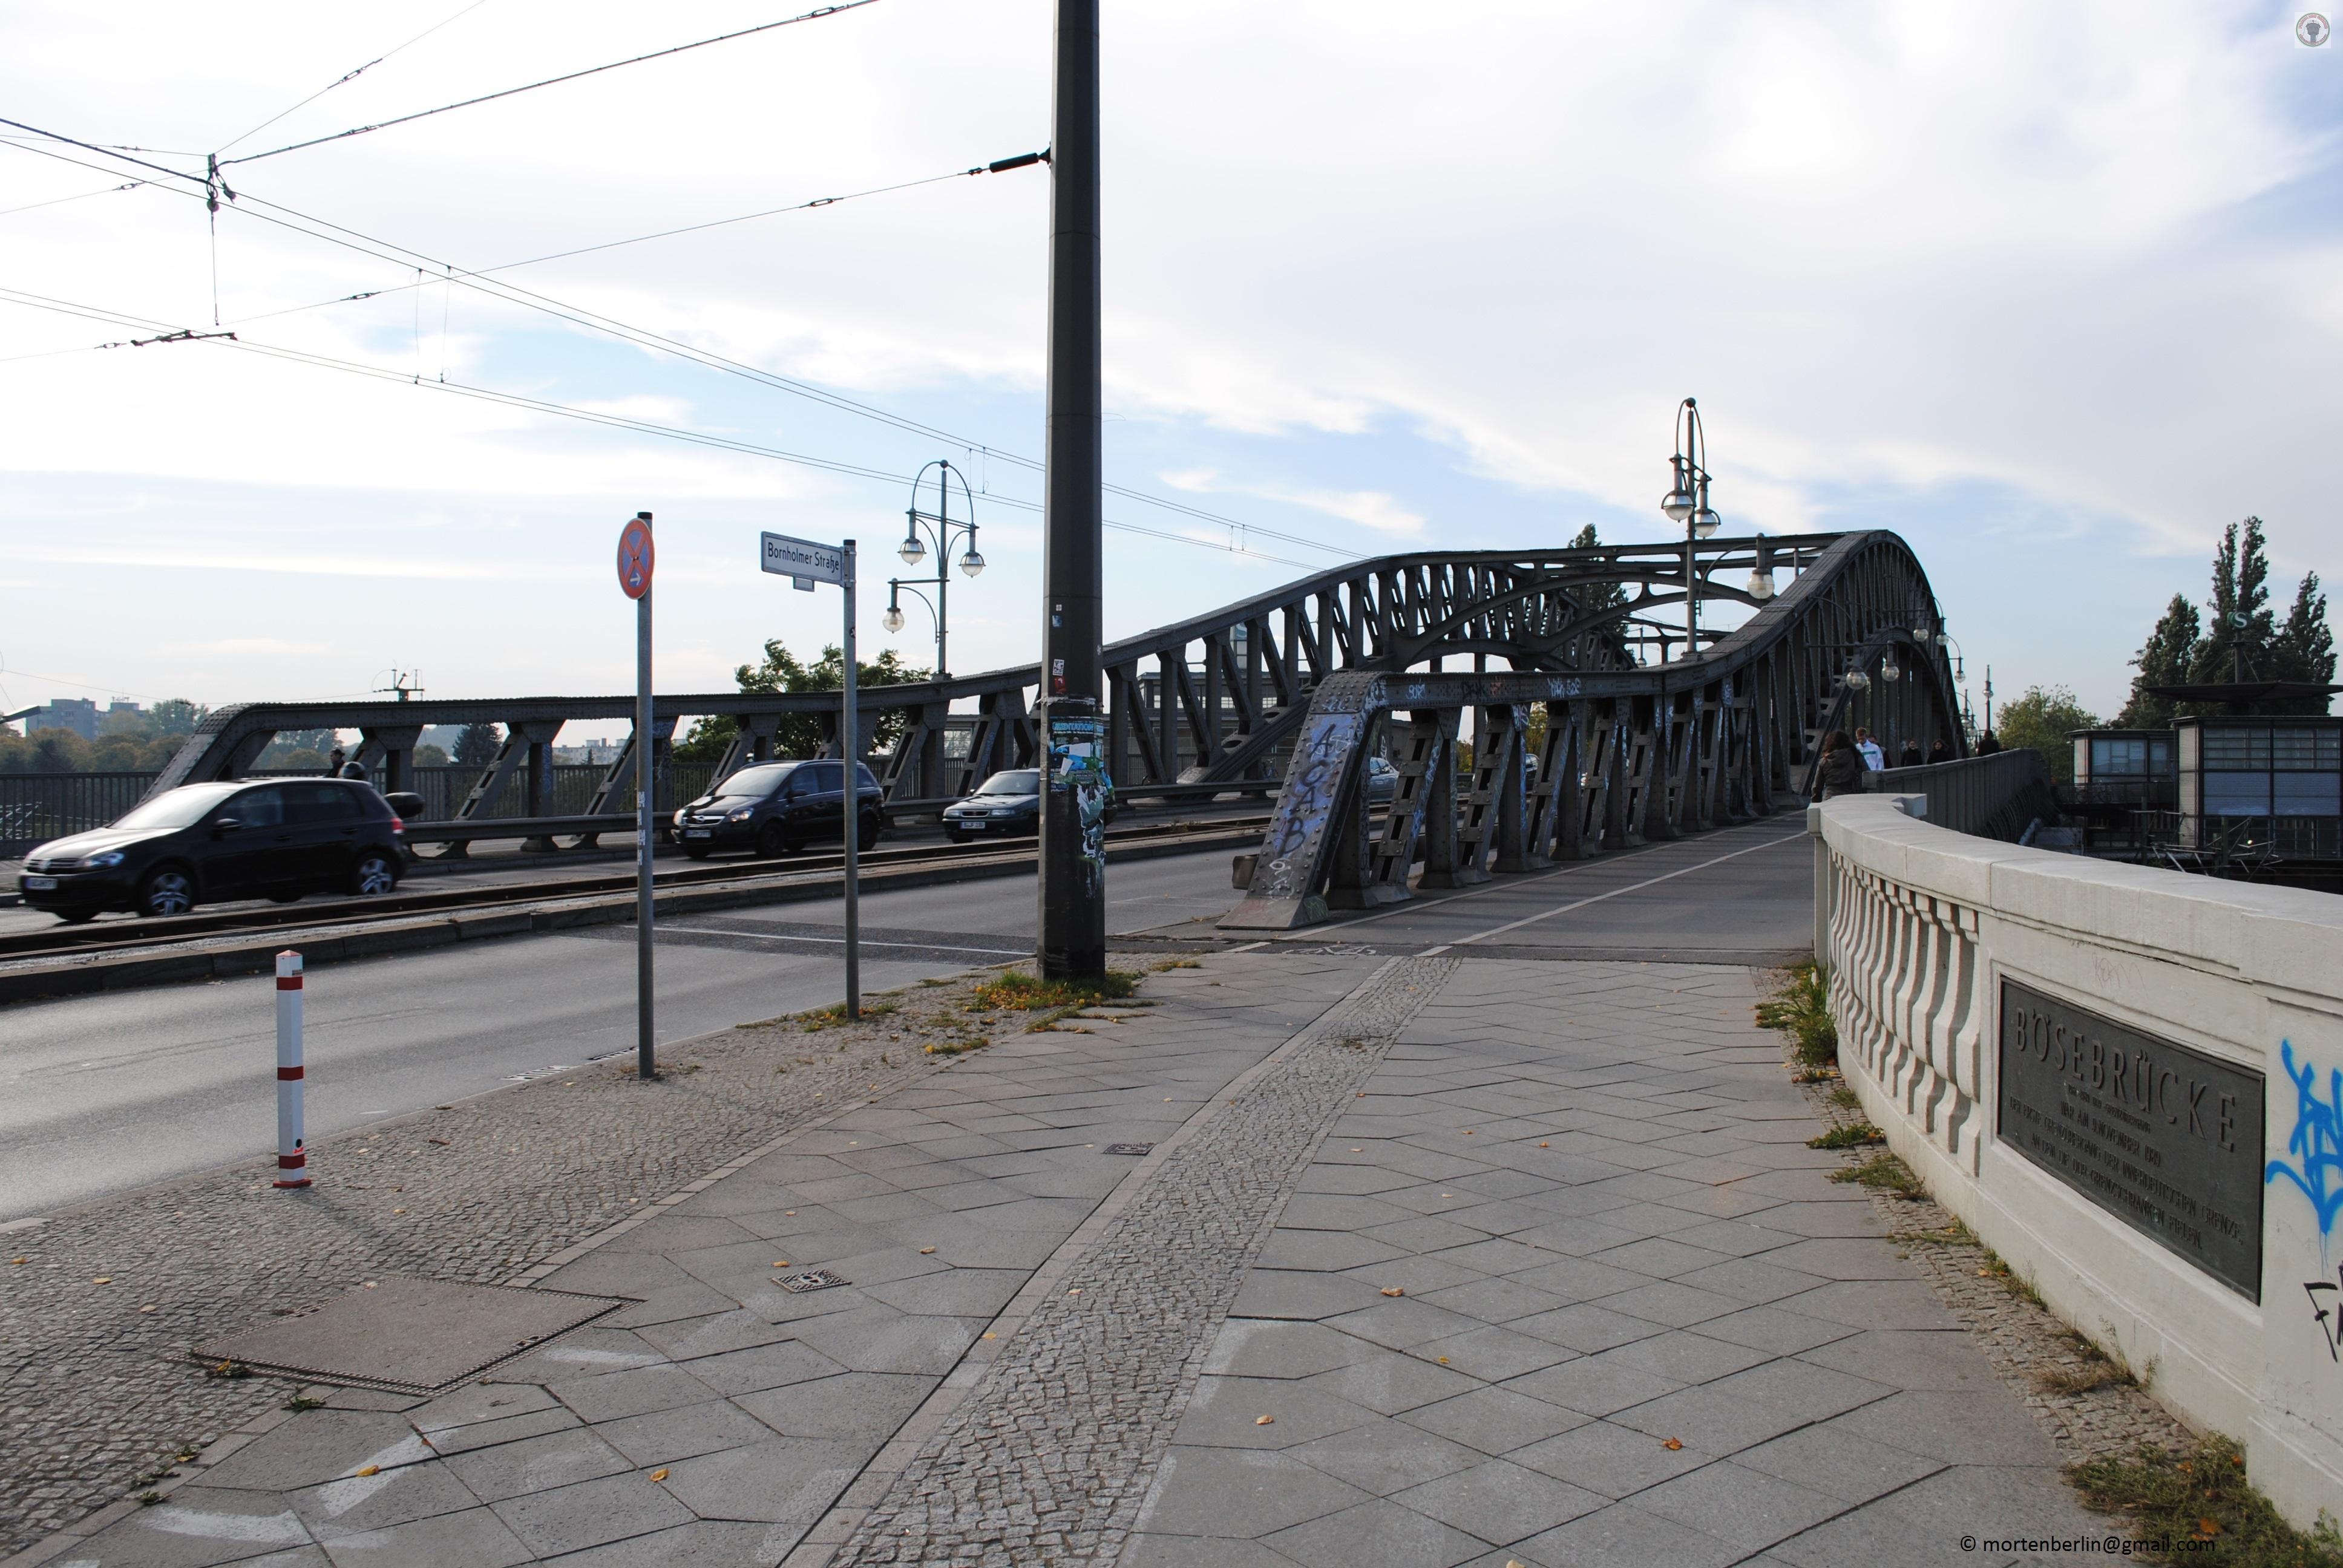 Bornholmer Strasse